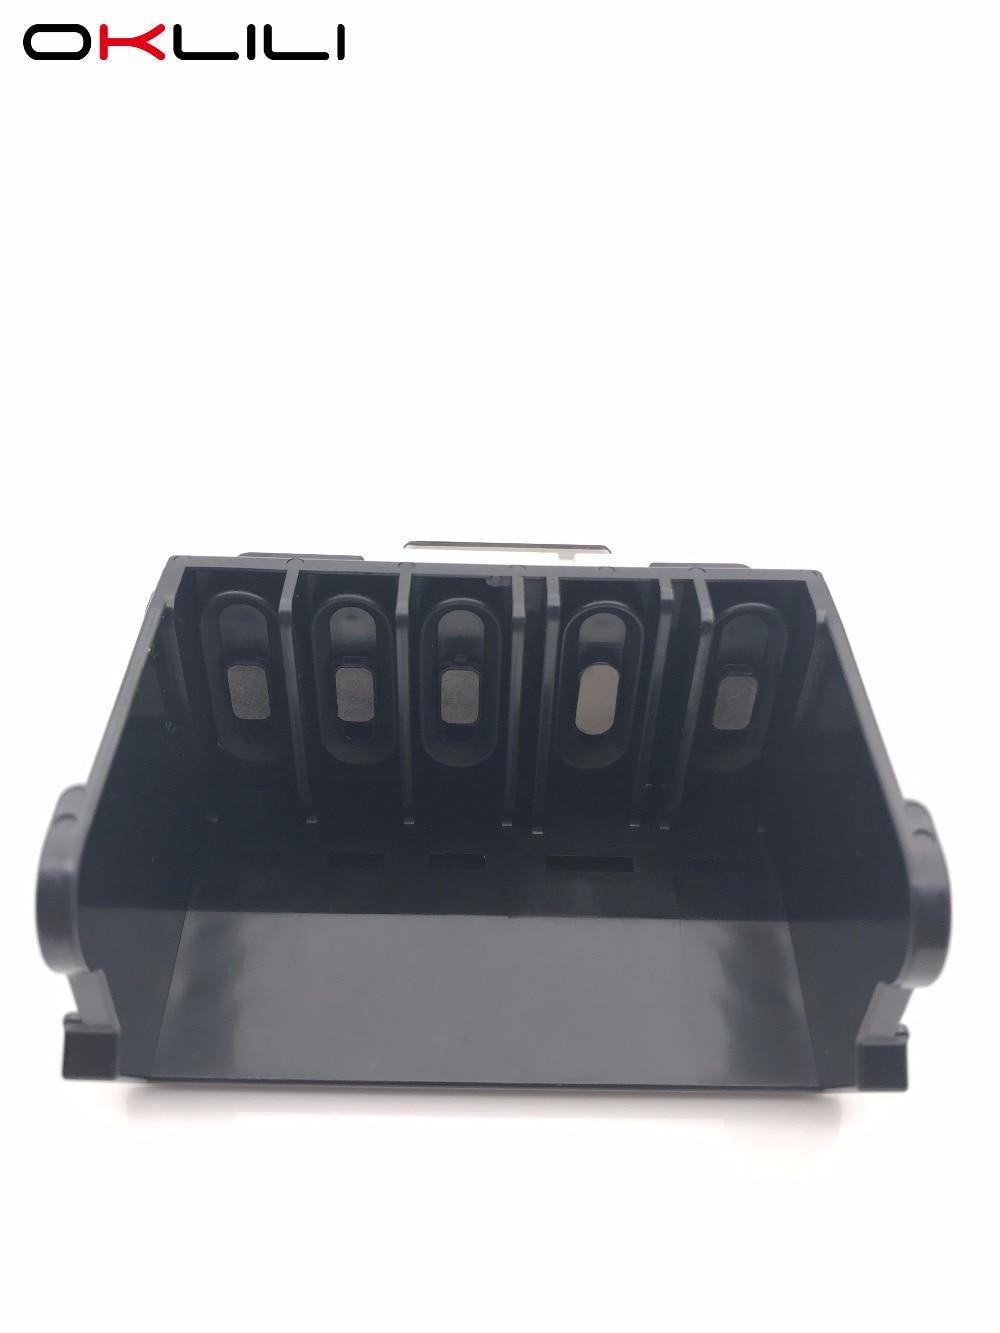 OKLILI ORIGINAL QY6 0066 QY6 0066 000 Printhead Print Head Printer Head for Canon MX7600 iX7000